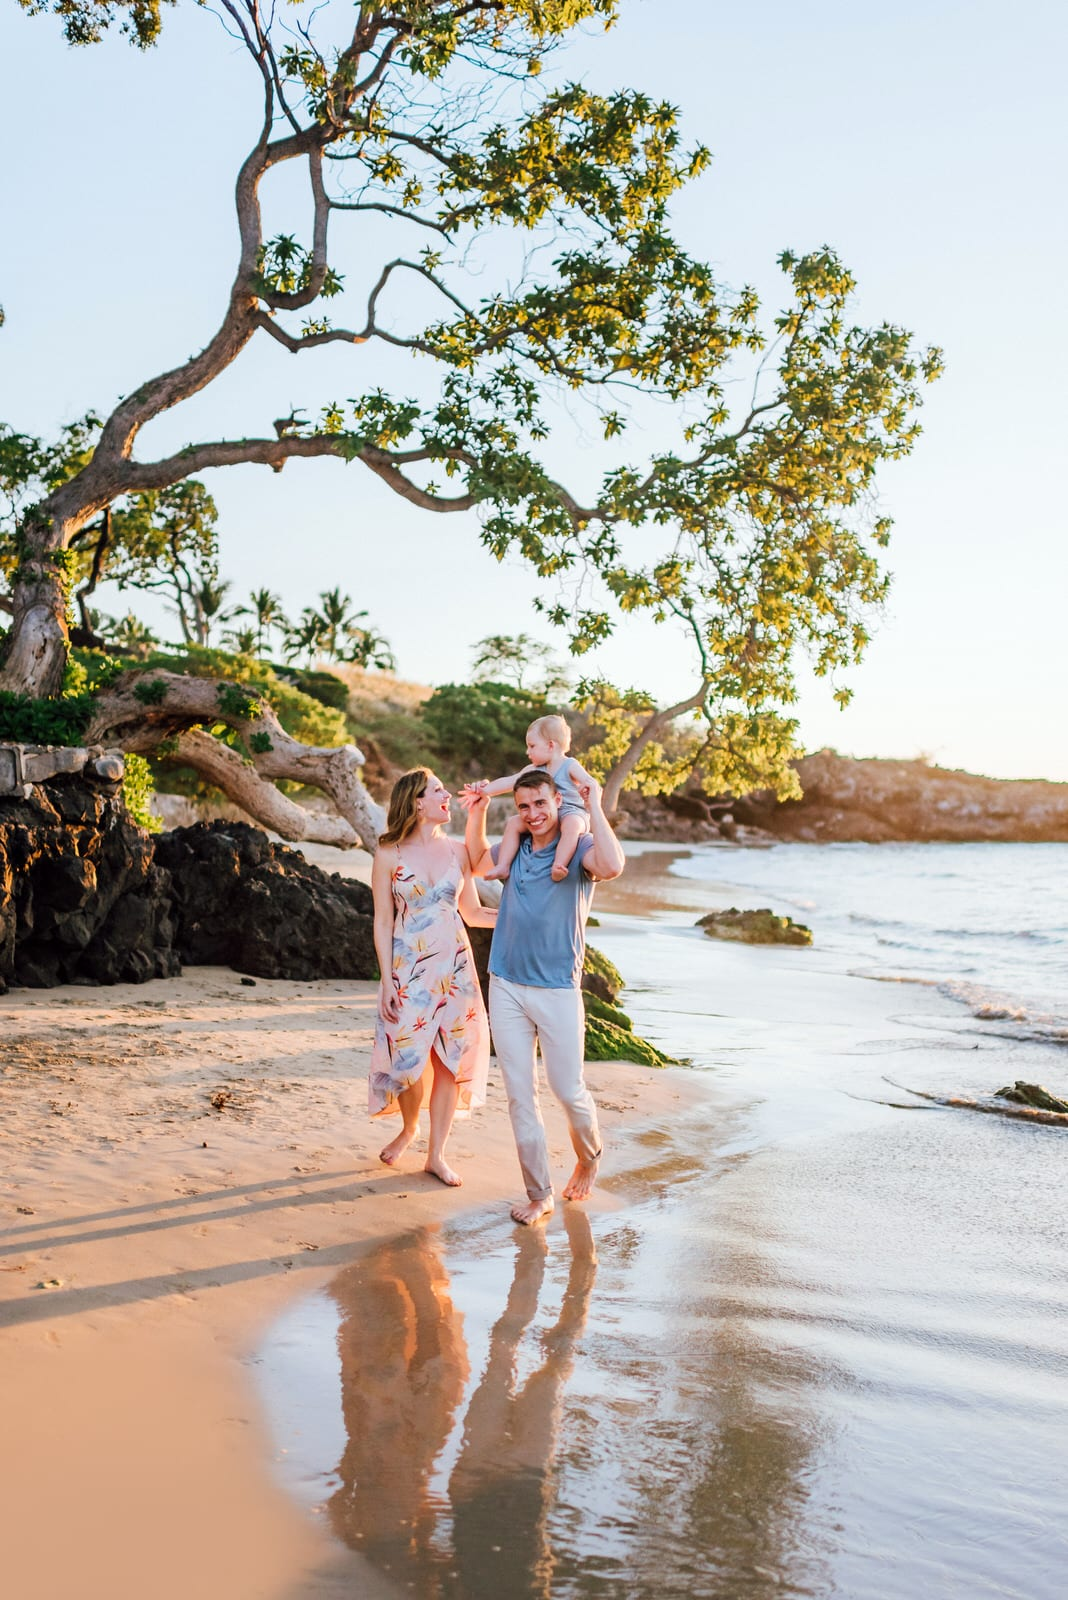 Family-Photographer-Mauna-Kea-Hotel-Large-Family-Colorful-Sunset-11.jpg